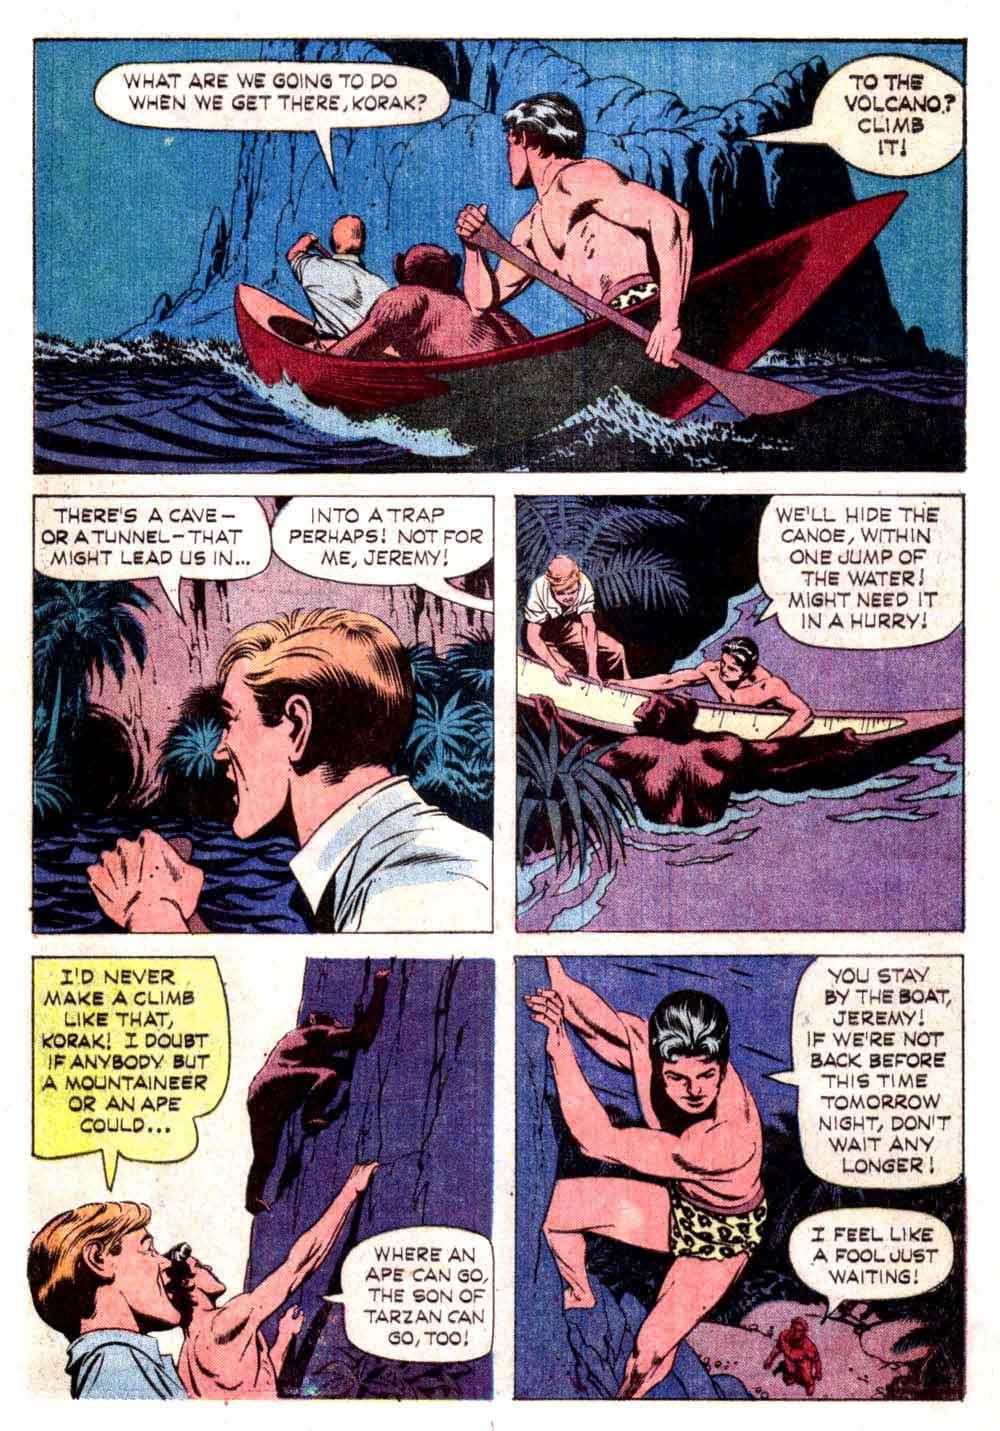 Korak Son of Tarzan v1 #3 gold key silver age 1960s comic book page art by Russ Manning